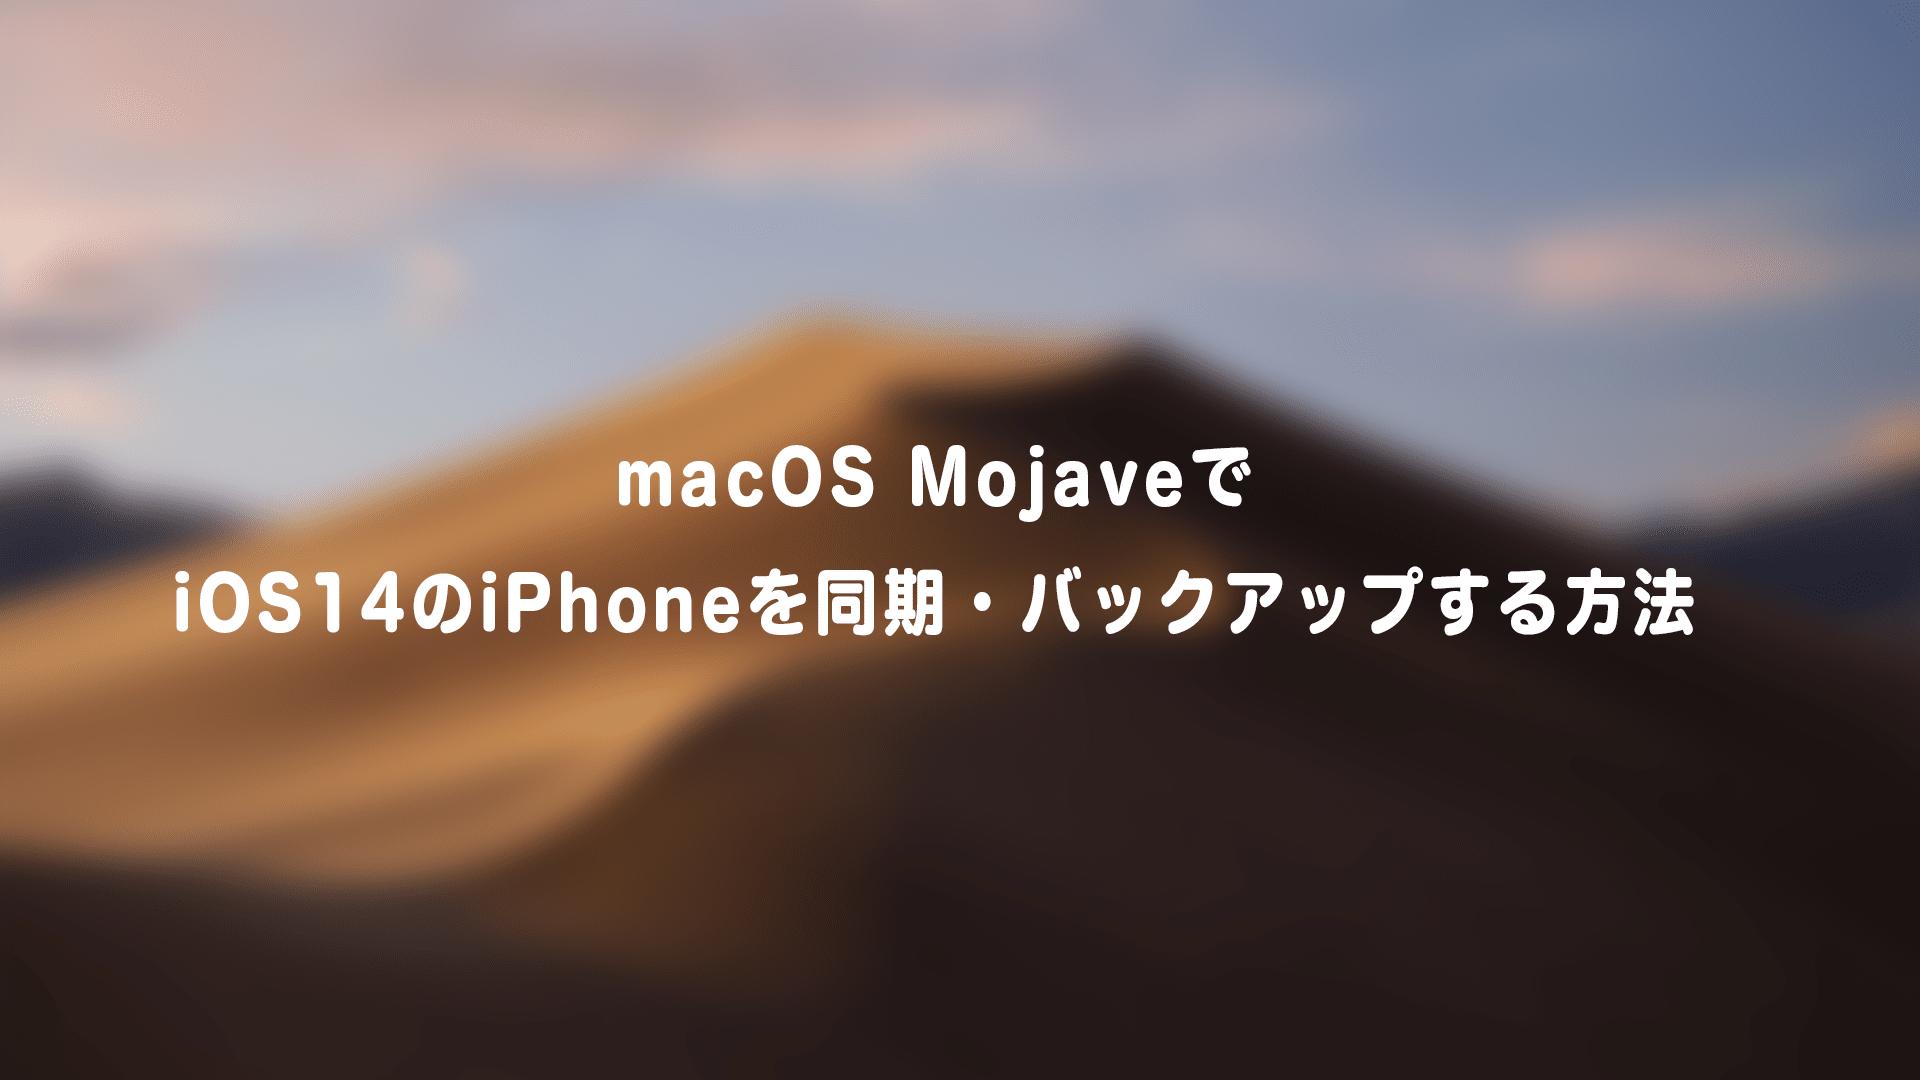 mojaveBackup - macOS MojaveでiOS14のiPhoneをバックアップ・同期する方法